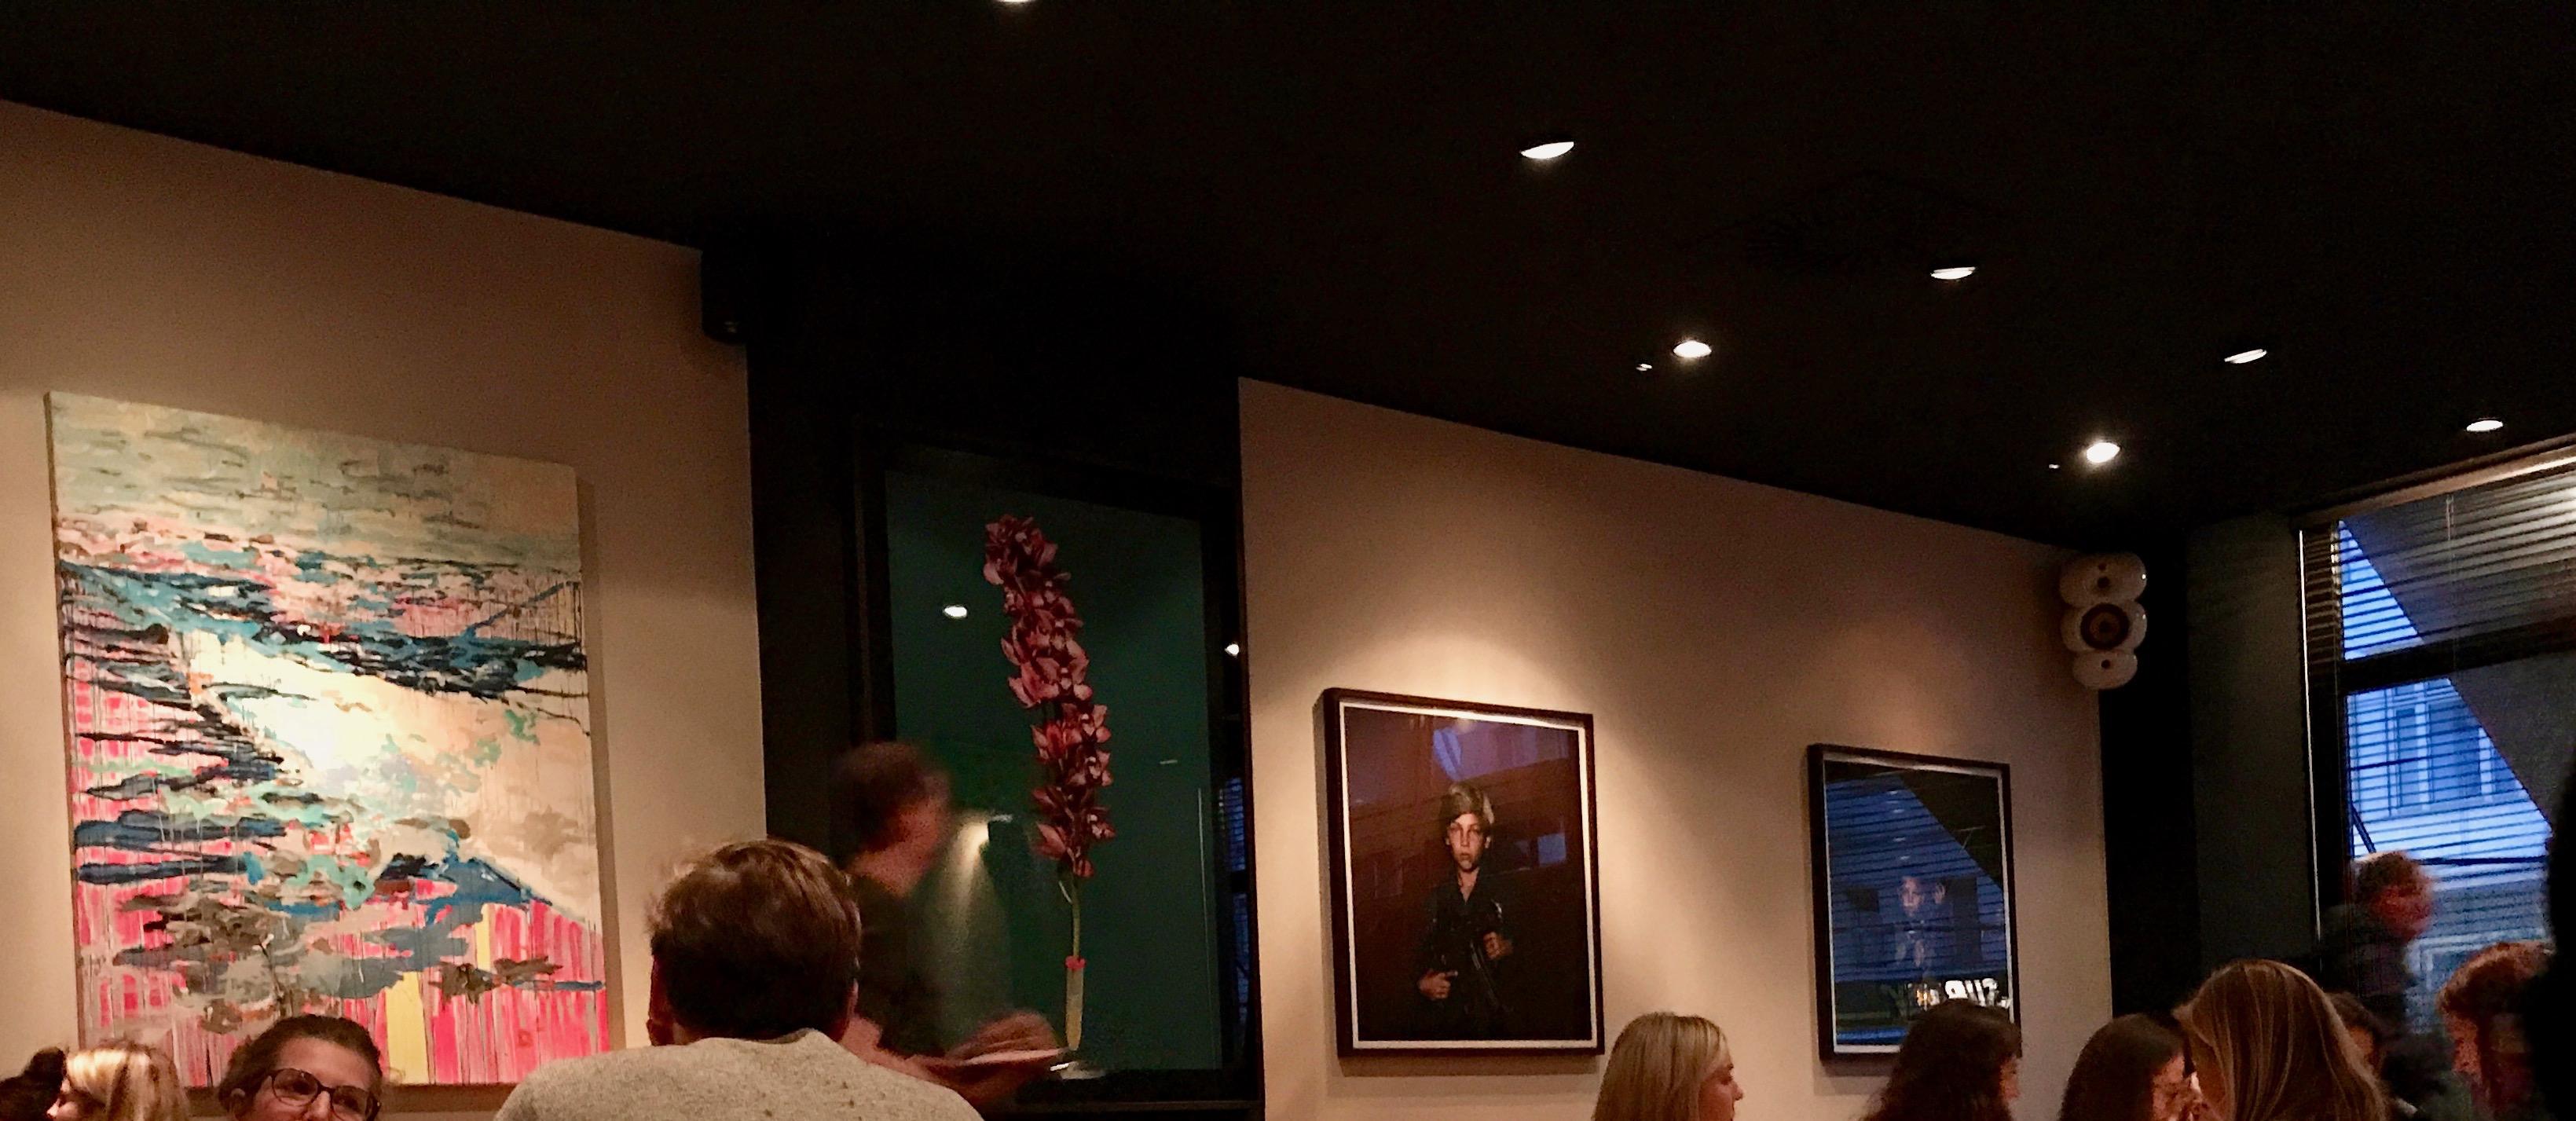 Pantry diverse Kunst an den Wänden